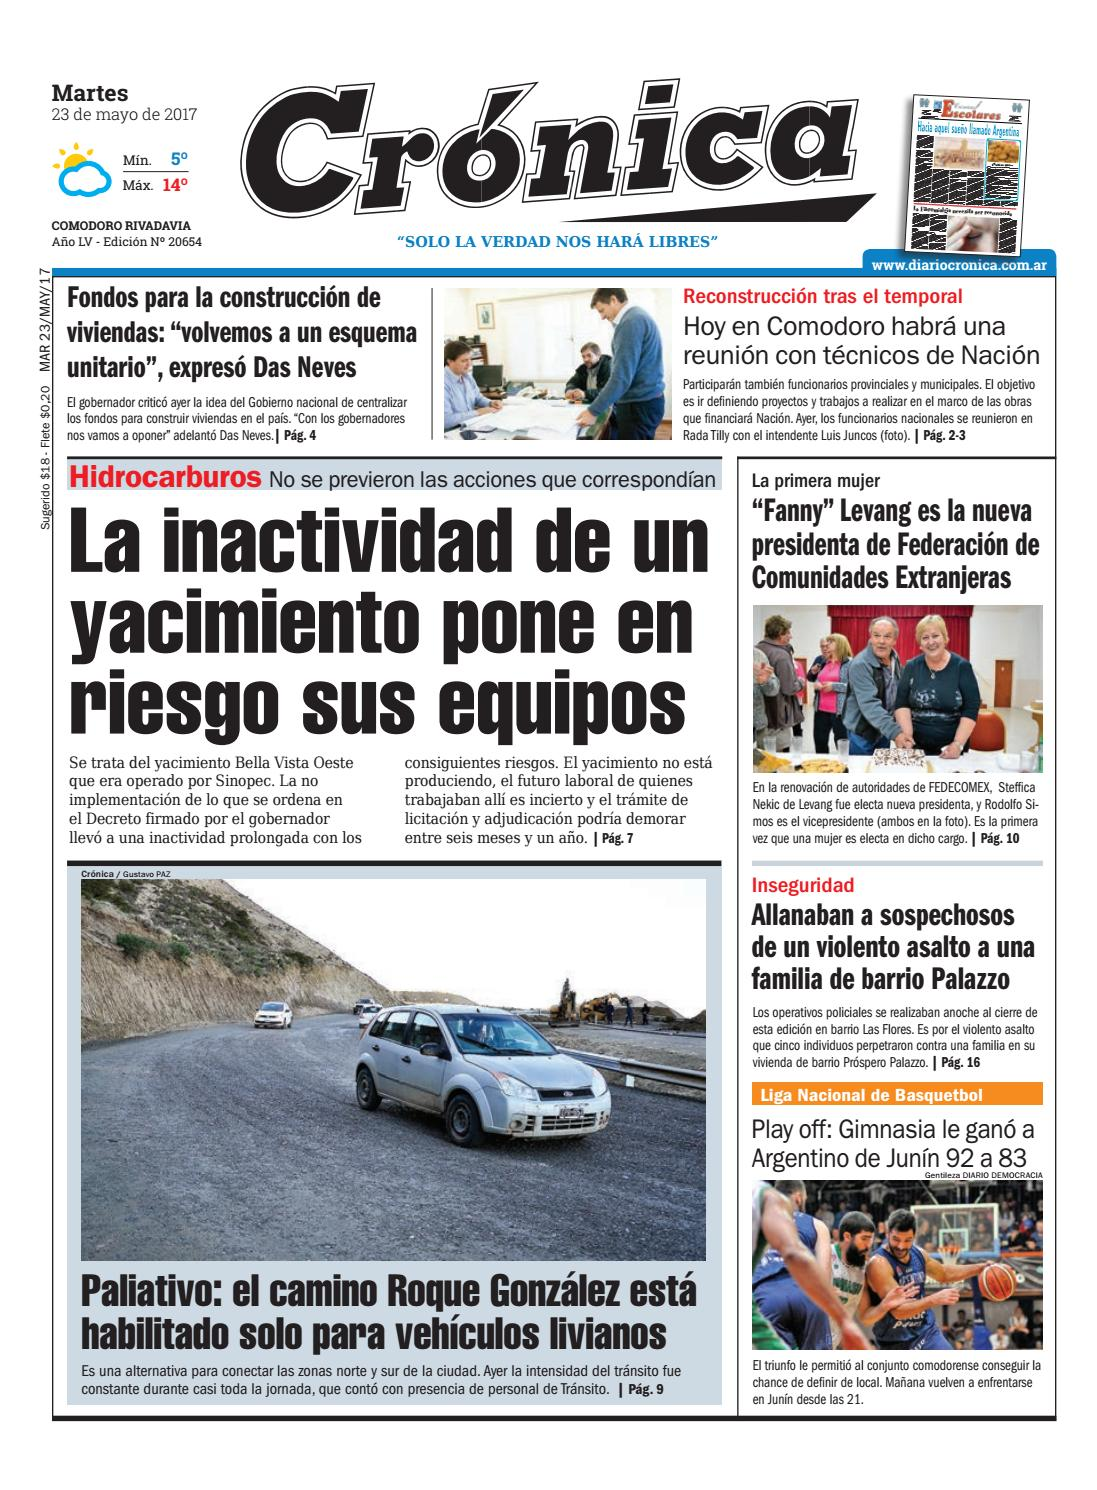 cbbfebe518 9e679d6850c7da93ddf404c68a06dcd8 by Diario Crónica - issuu